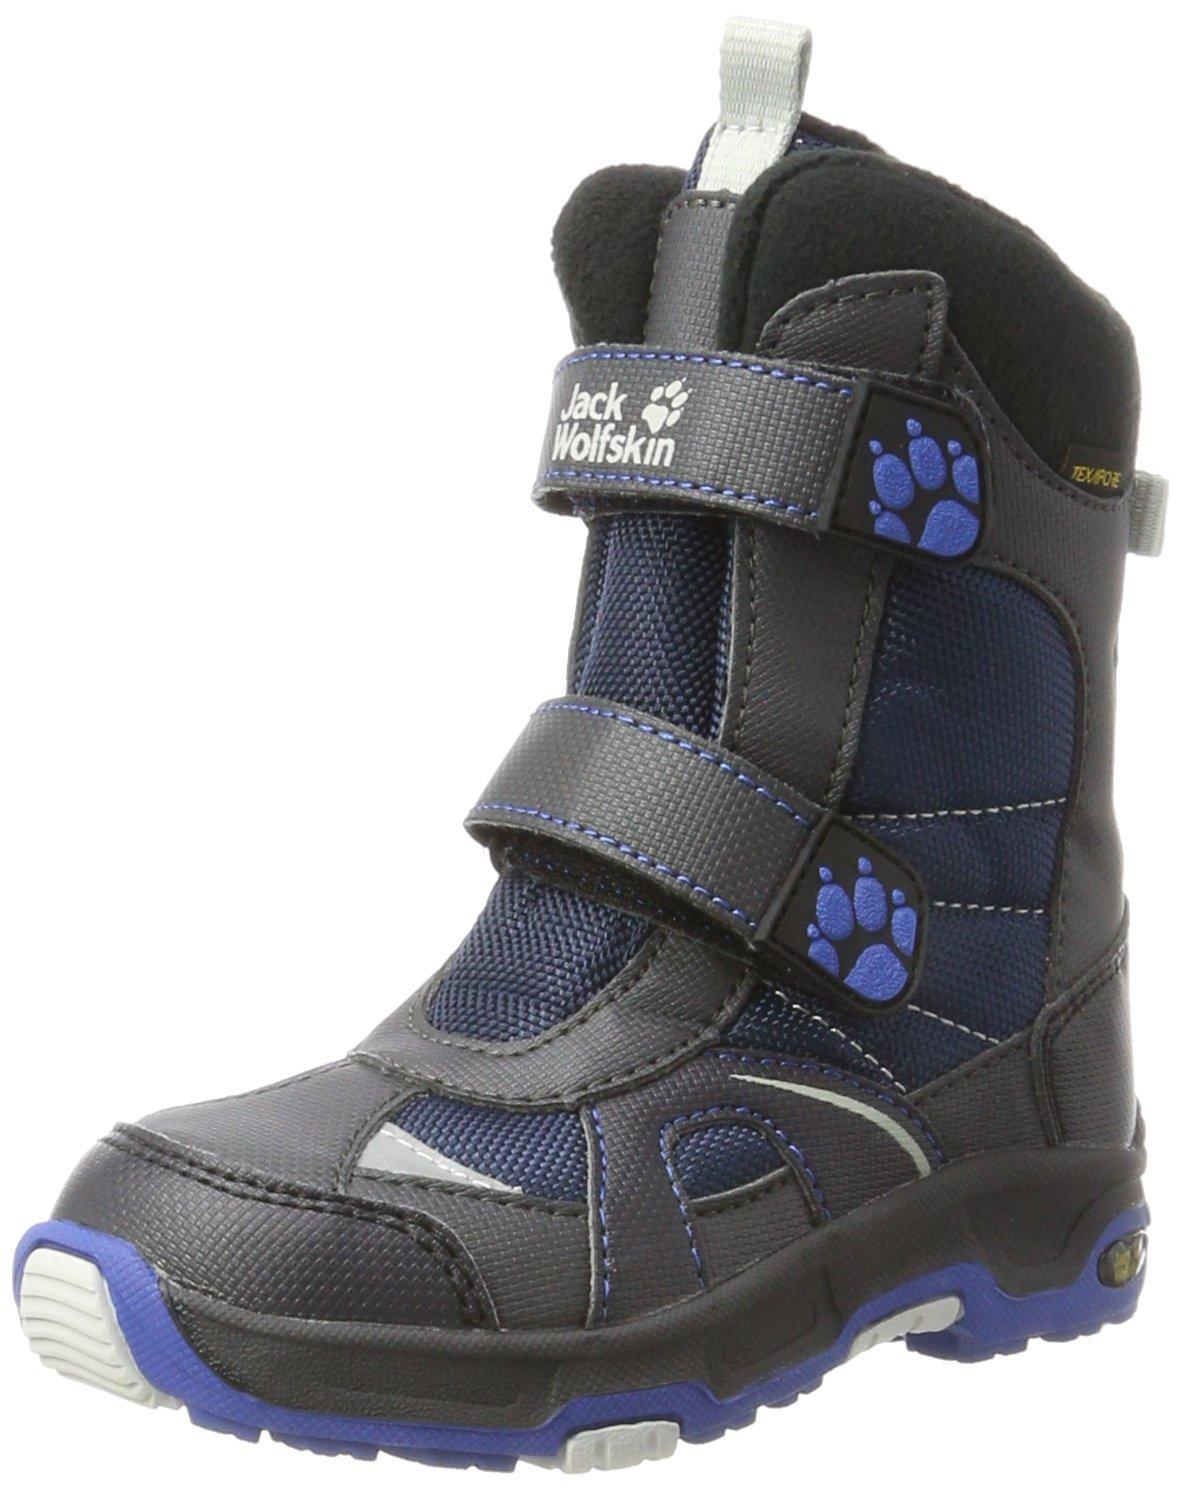 Jack Wolfskin Boy's S Polar Bear Texapore Snow Boots Child 1